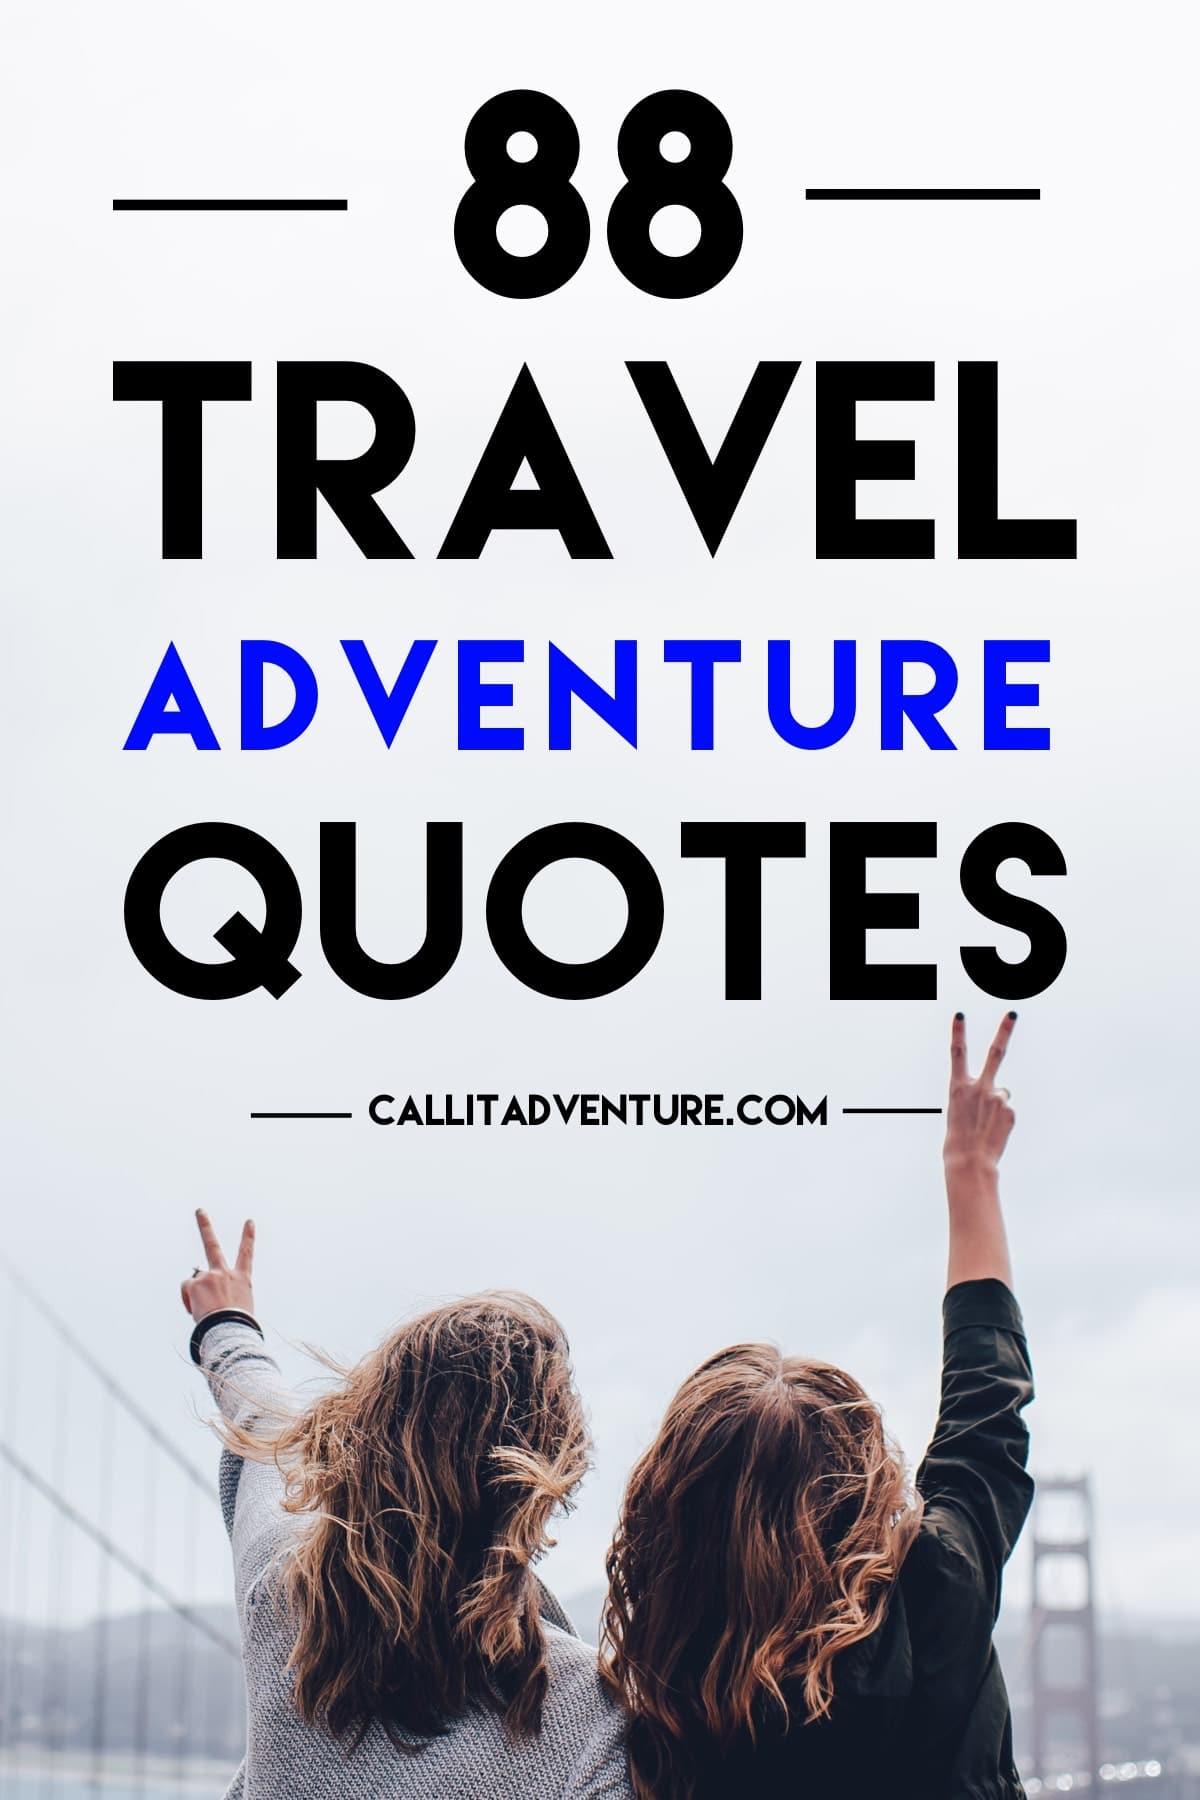 Call It Adventure